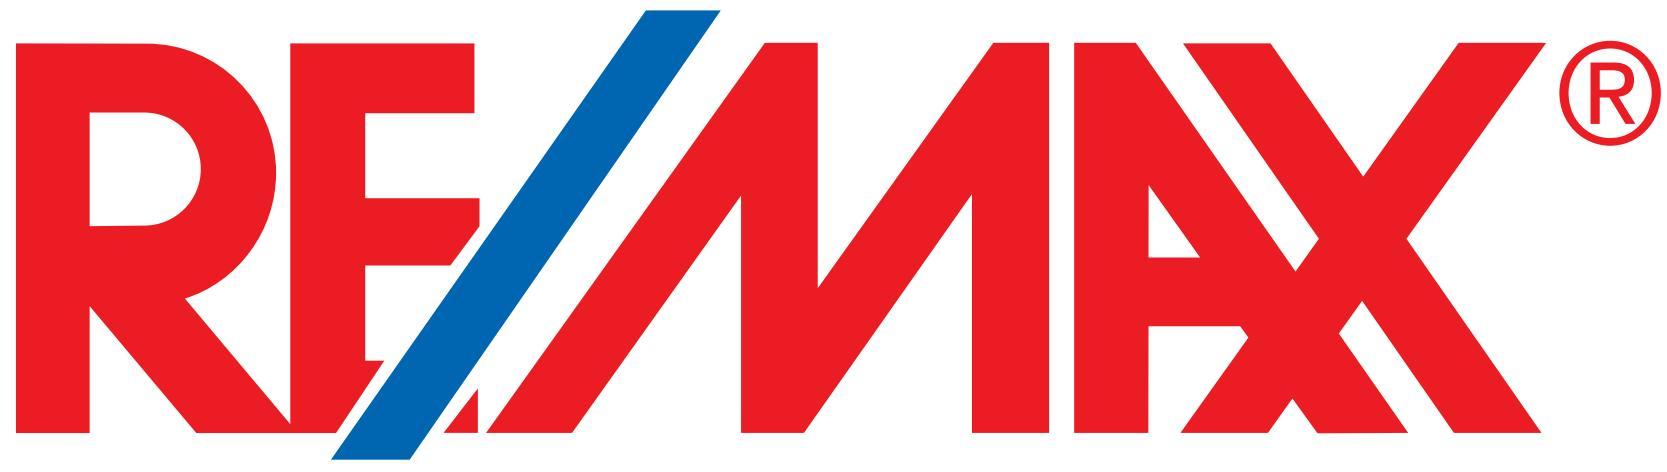 Remax Logo png